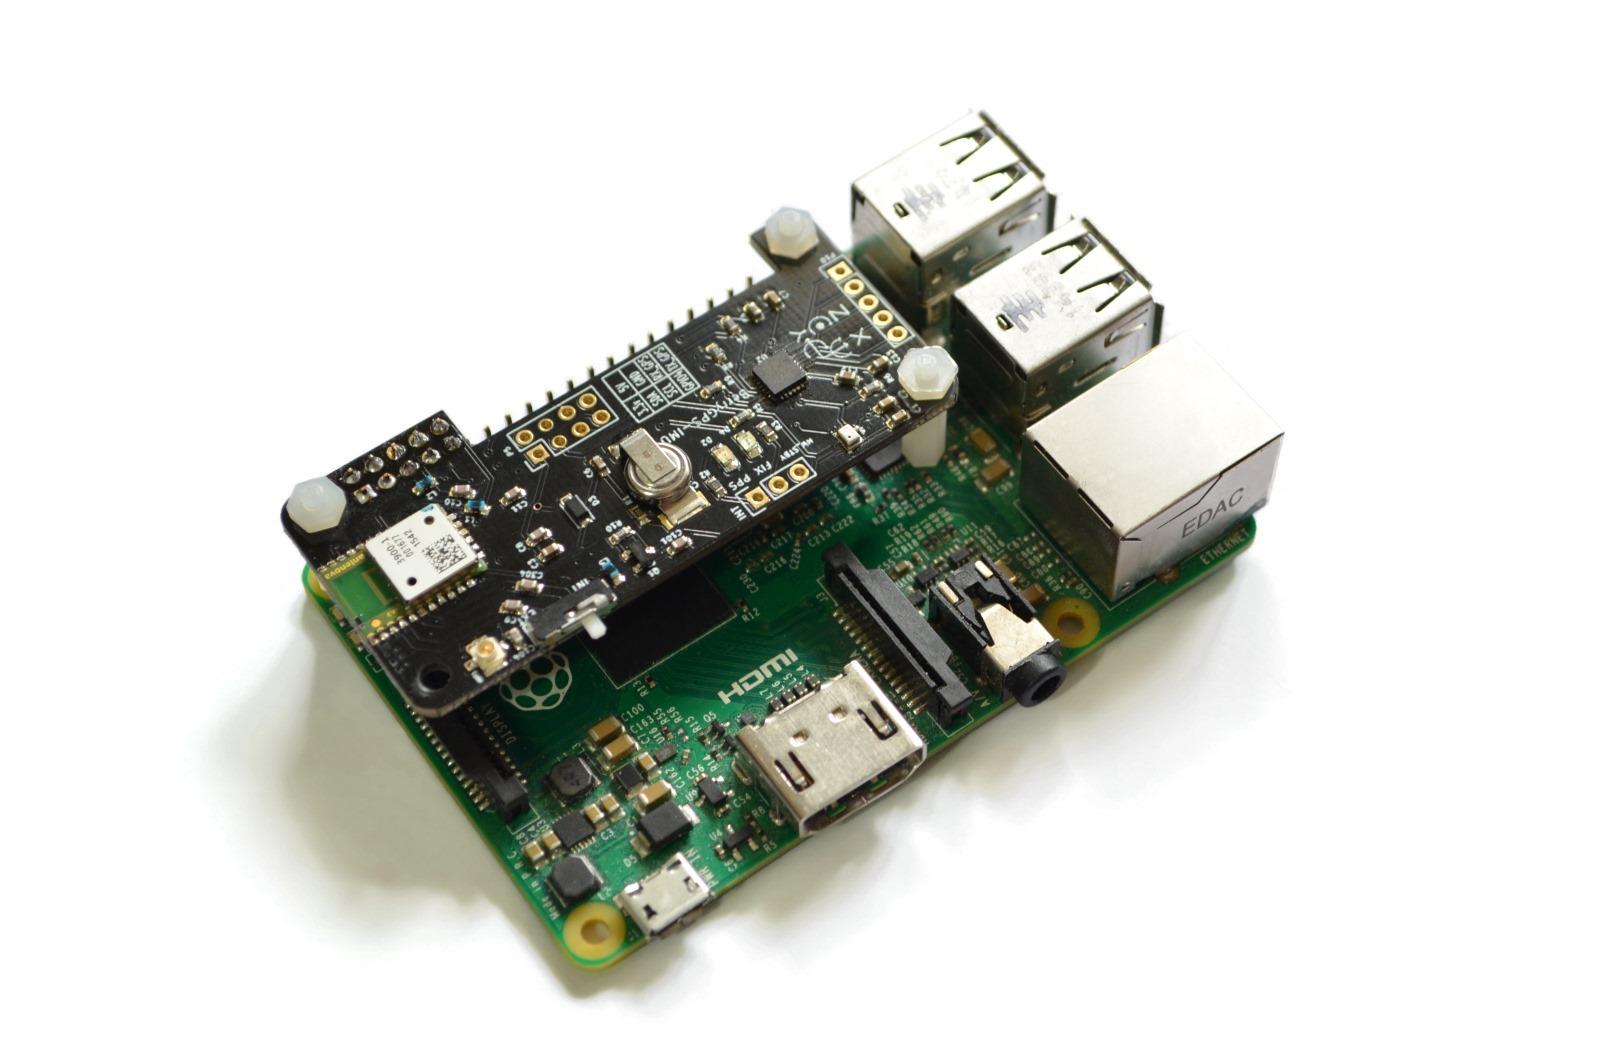 Berrygps Imu V3 Home Diy Magnetic Field Meter Magnetometer Circuit Raspberry Pi Gps